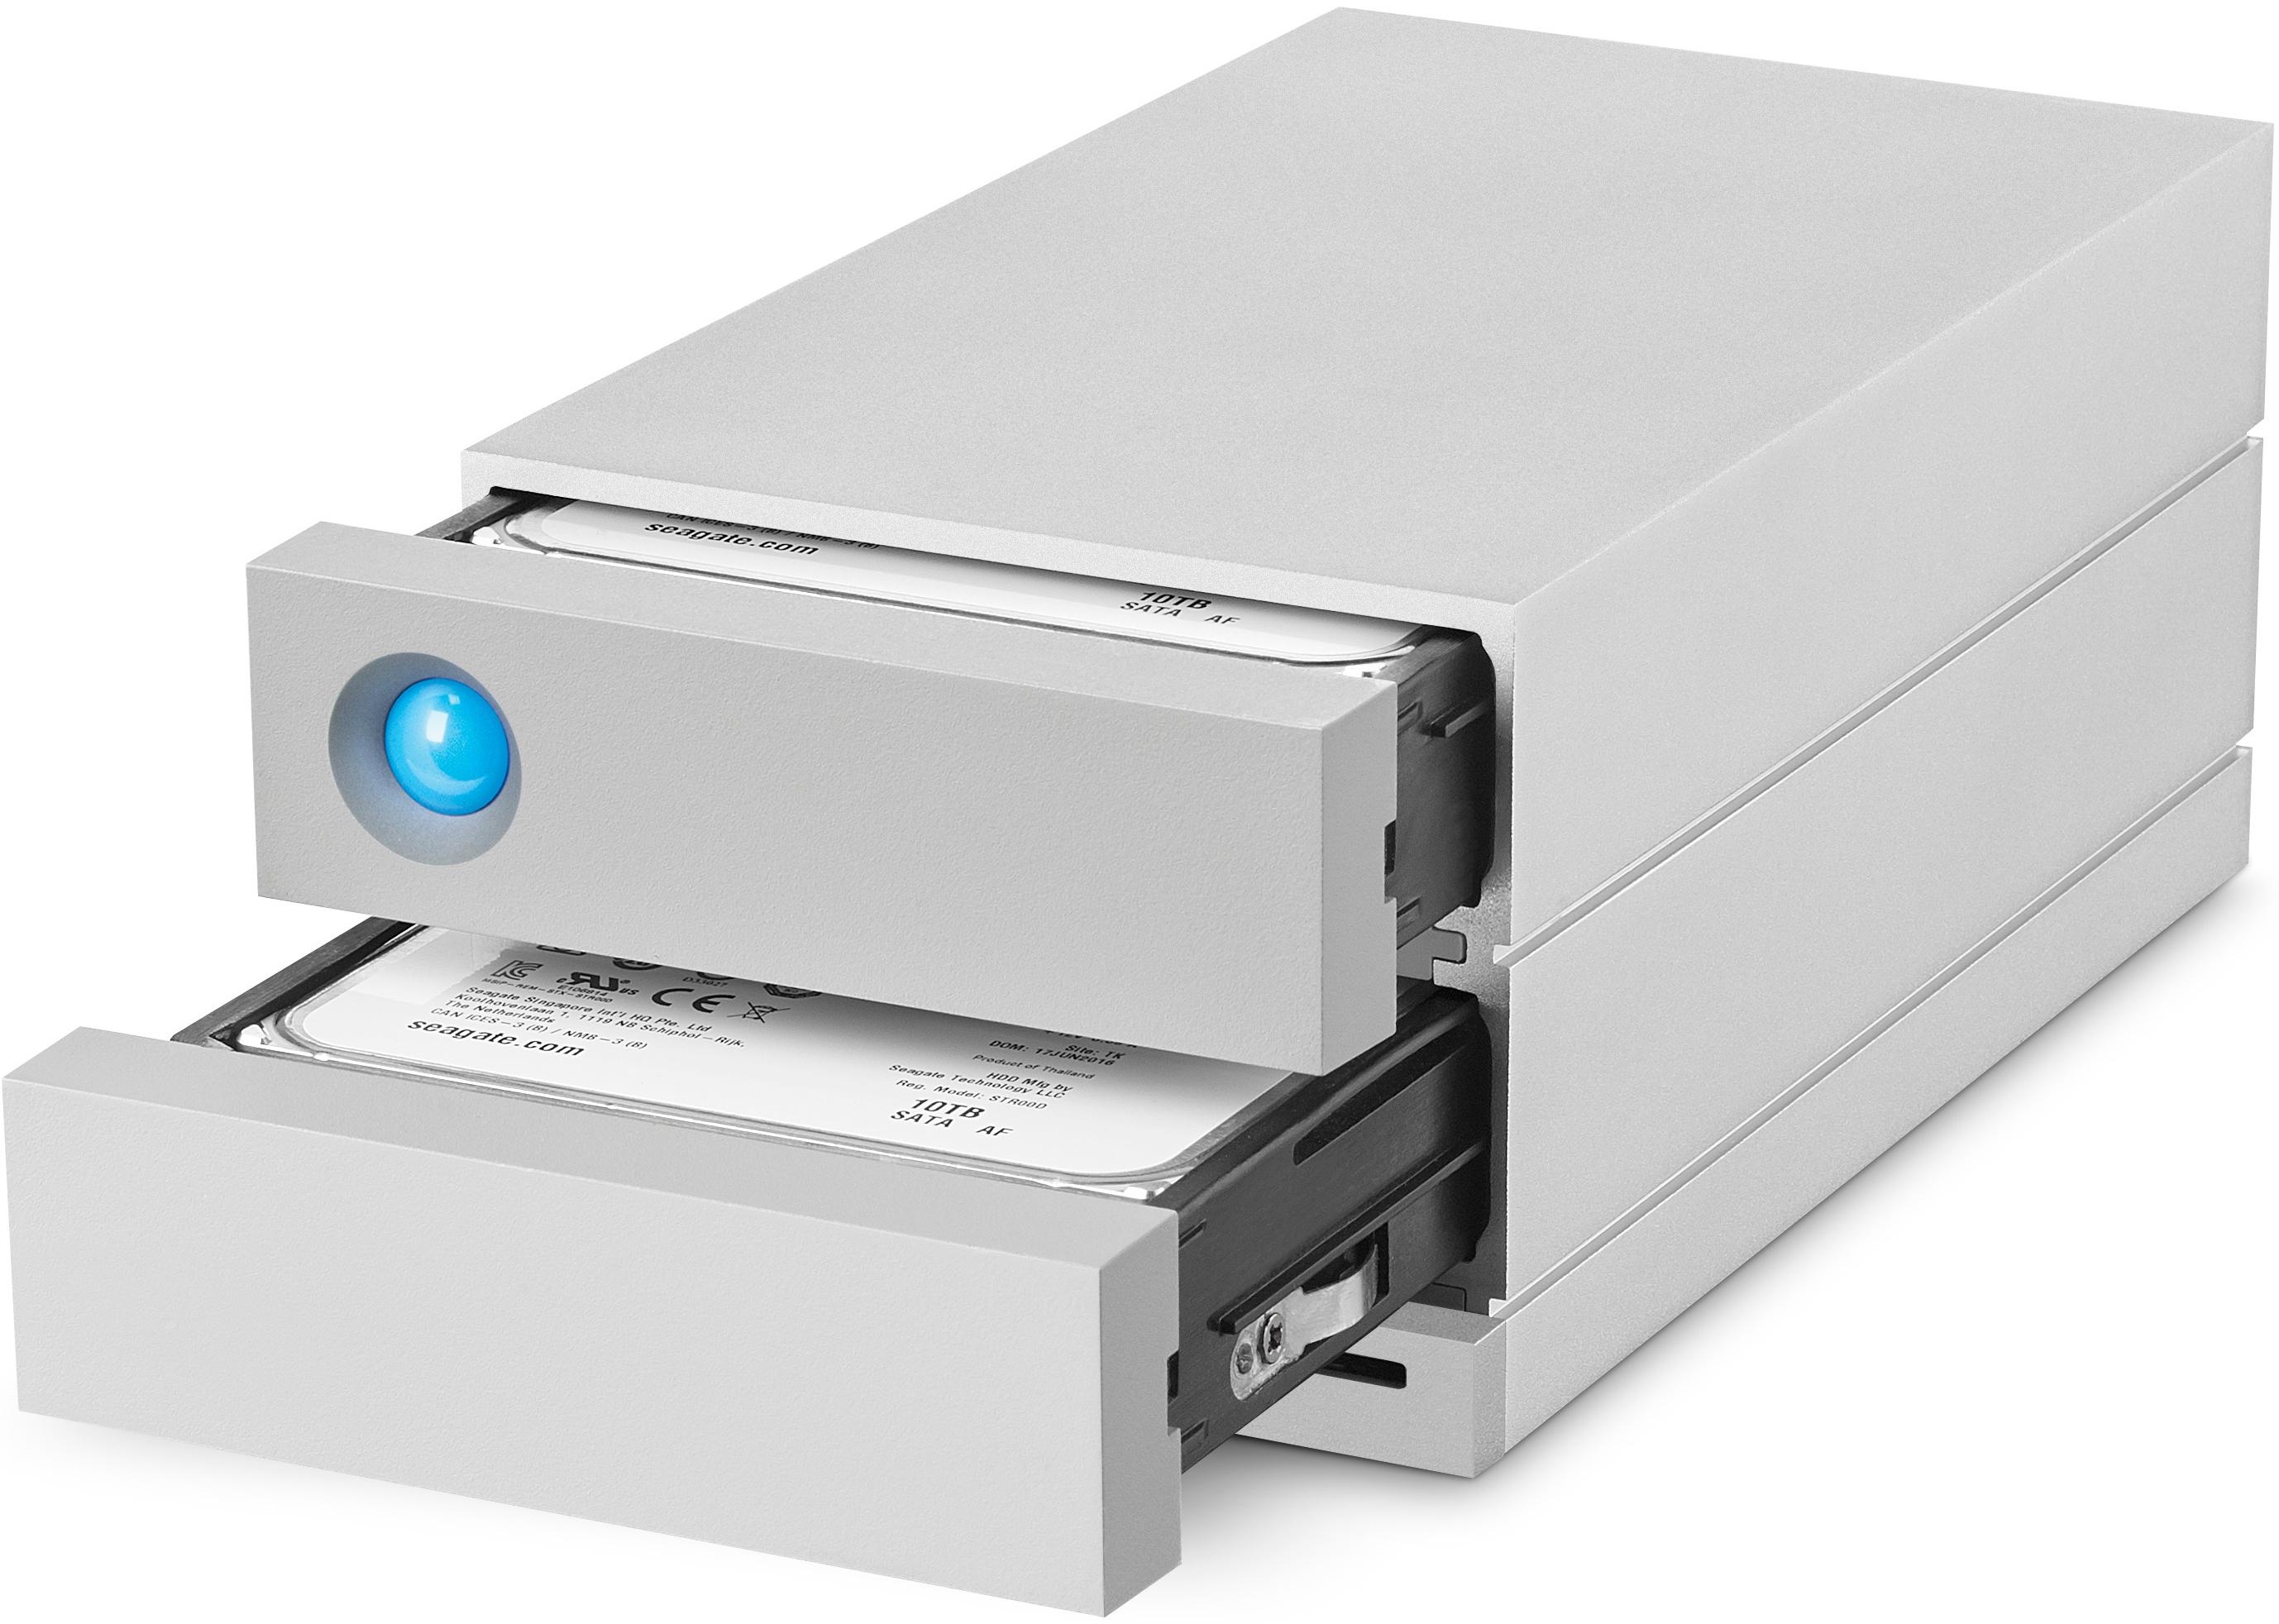 Lacie Announces 2big Dock 2 Bay Tb3 Das With Card Reader